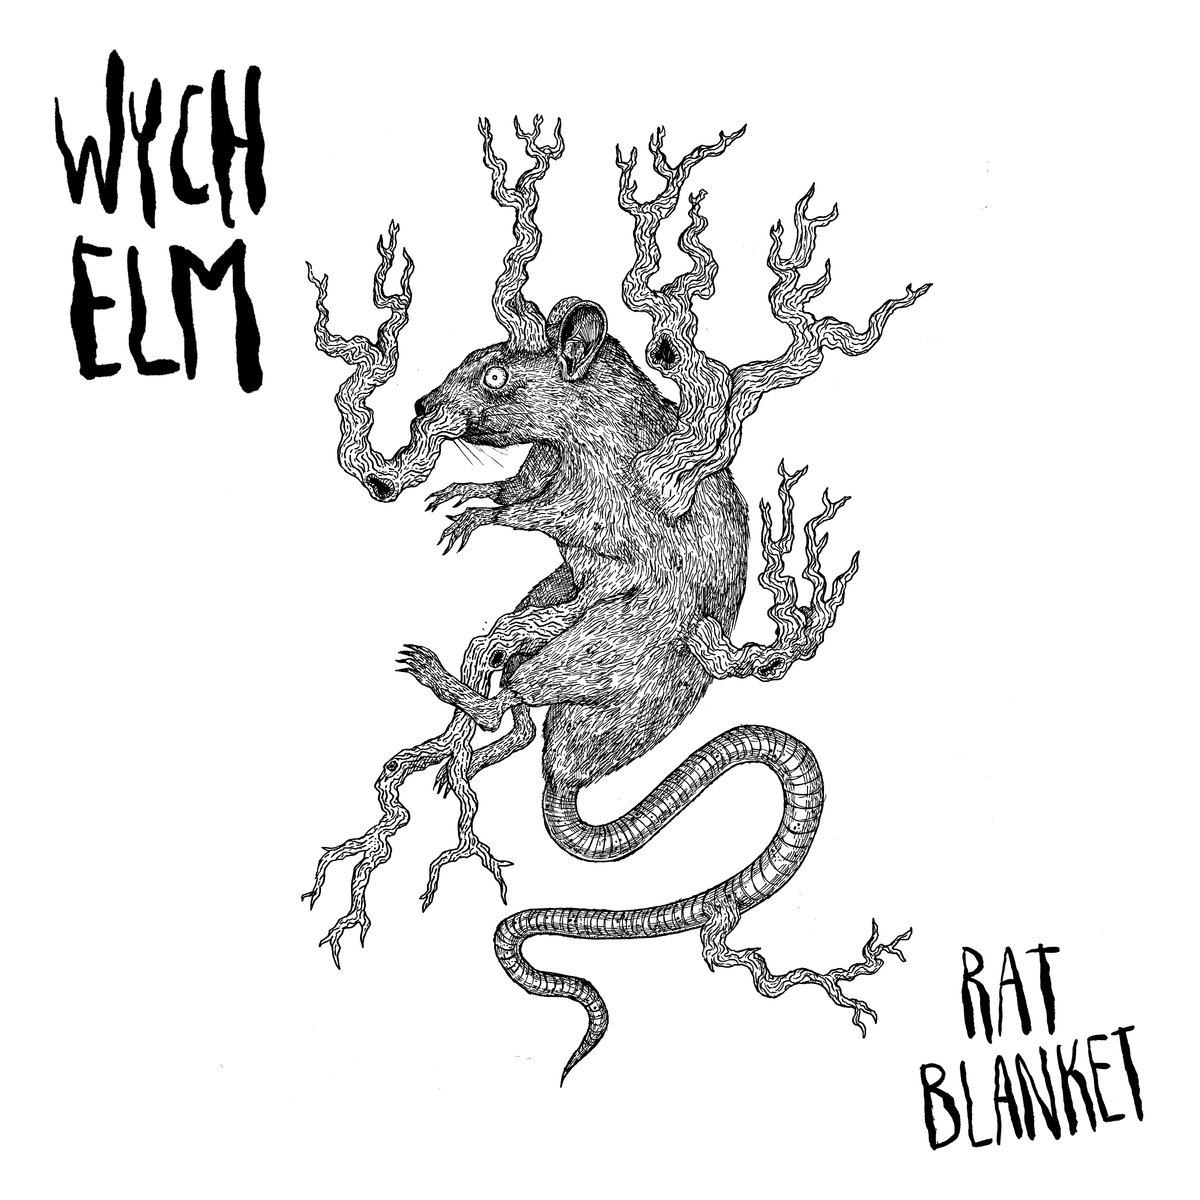 wych elm - rat blanket